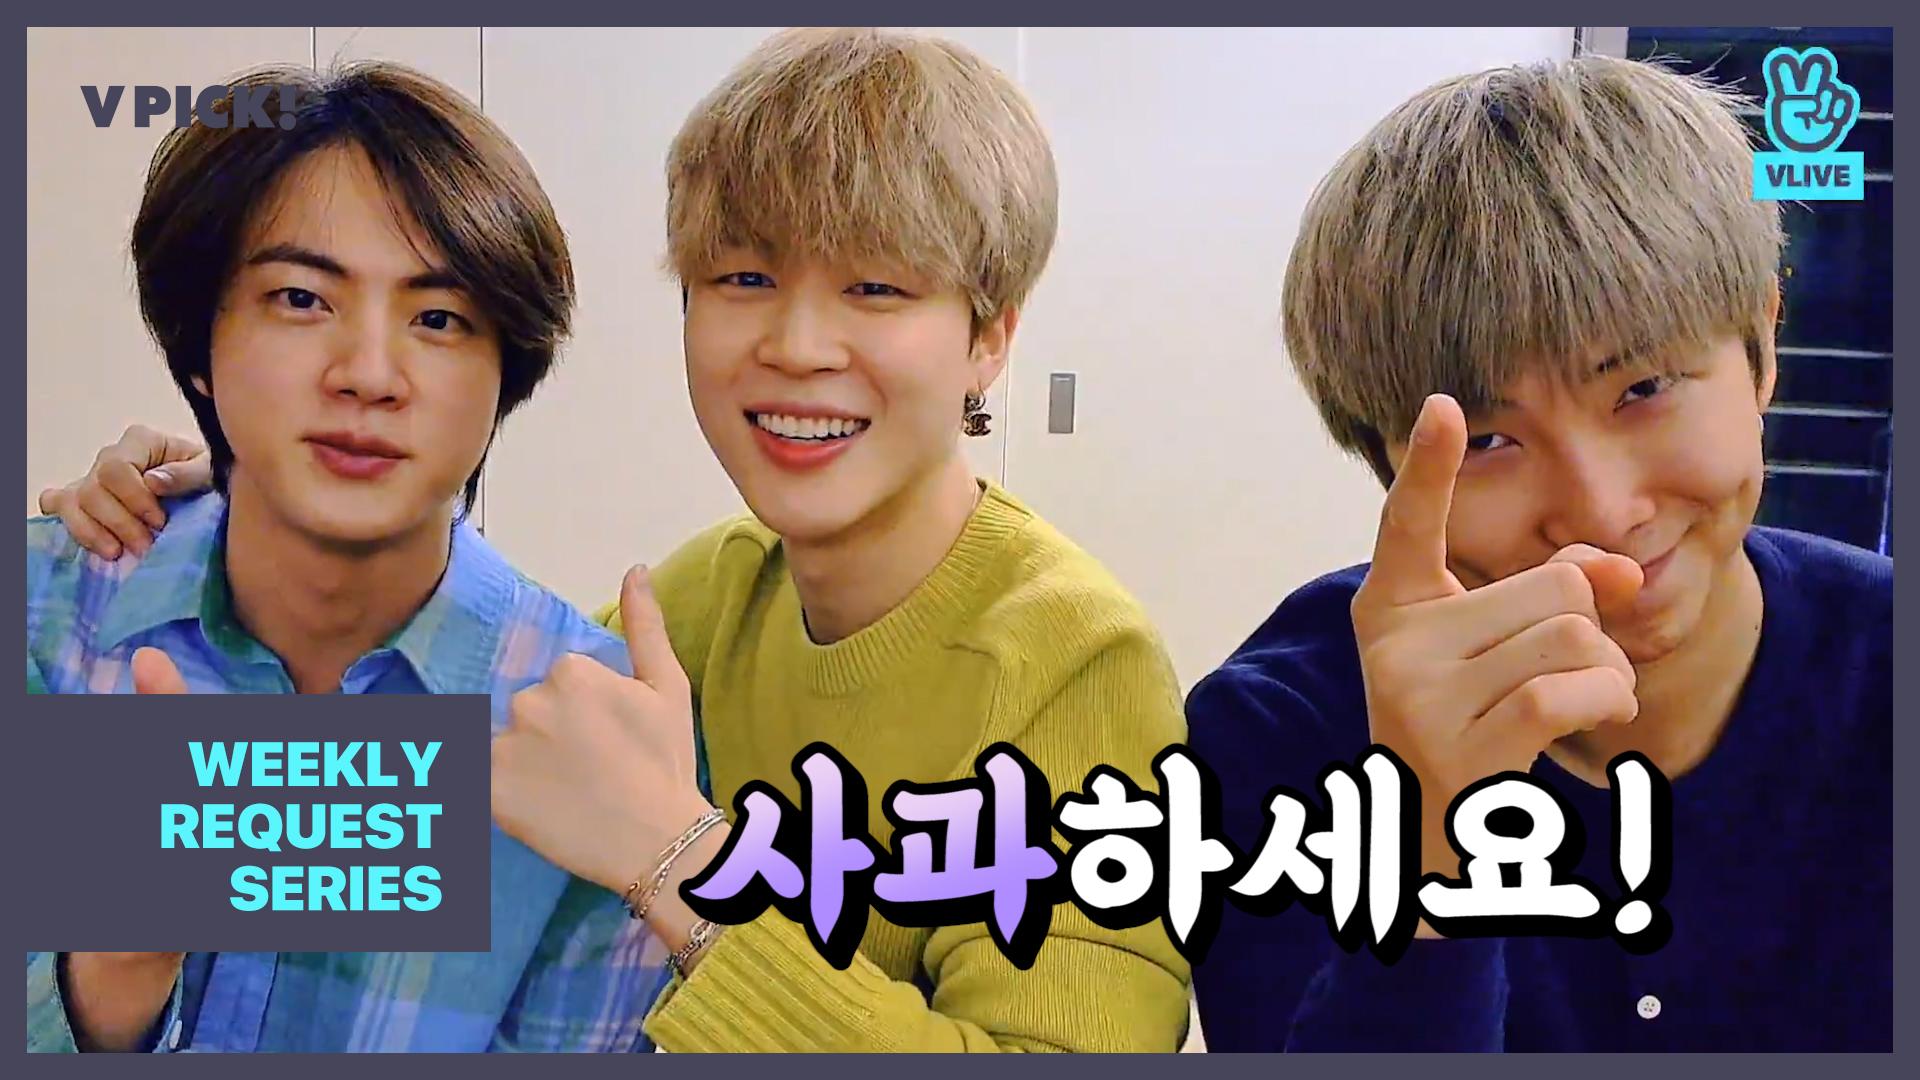 [BTS] 대국민 (사)랑스러움 (과)다 방송 함께해요❣️🍎 (JIN&RM&JIMIN making salad)